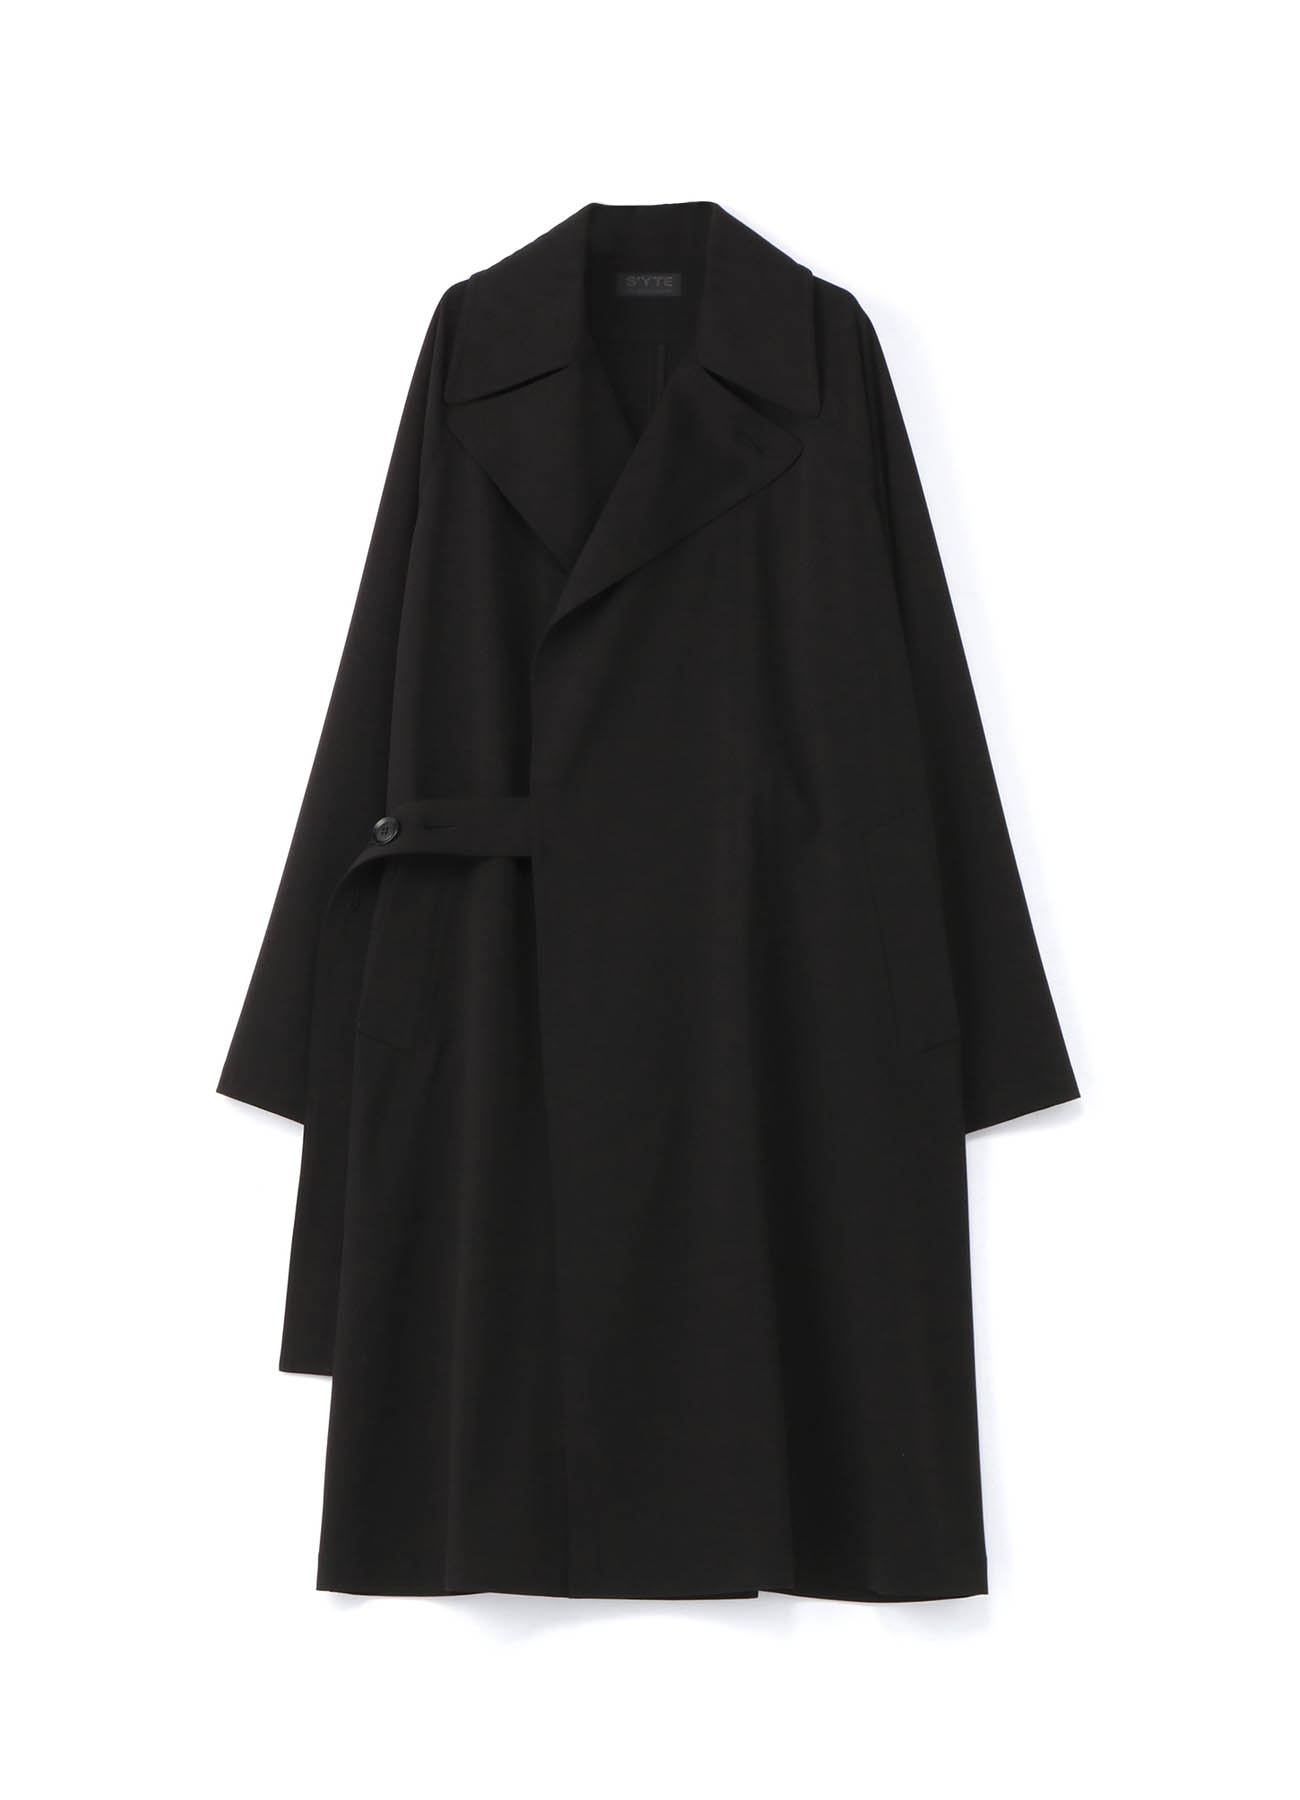 Pe/Rayon Gabardine Stretc Tielocken Coat